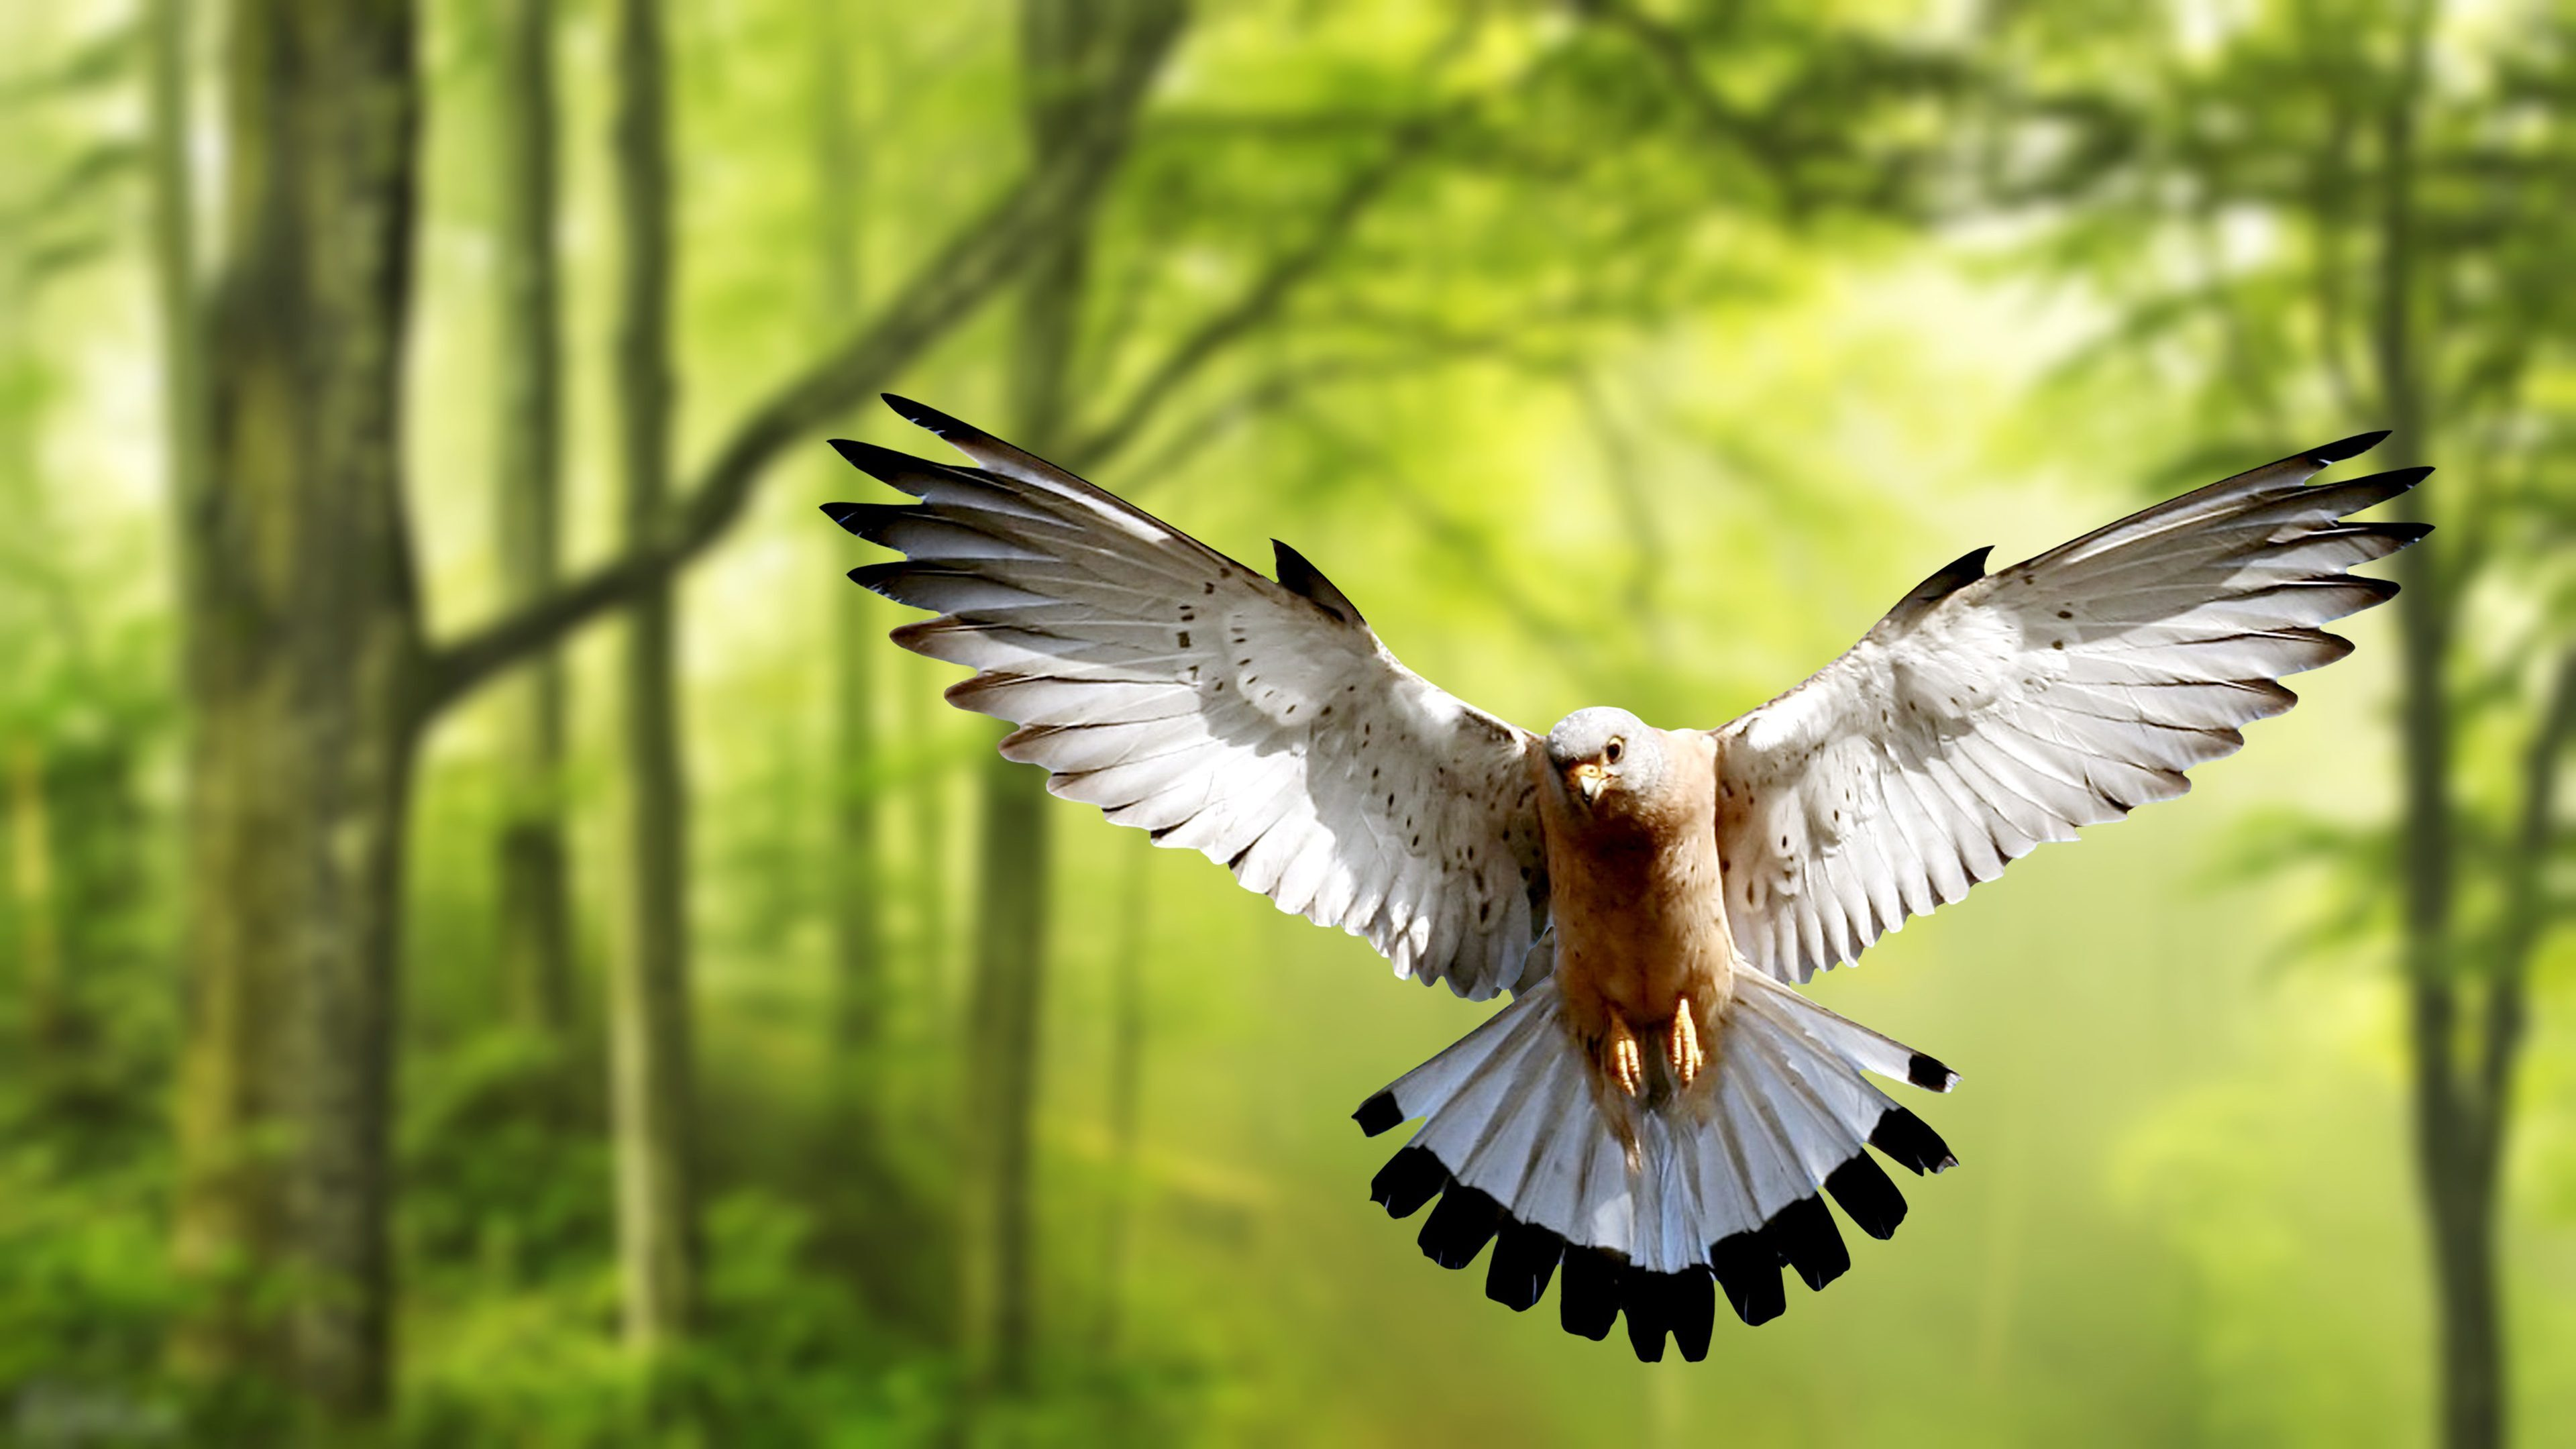 Flying Bird Pigeons 4k Hd Wallpapers